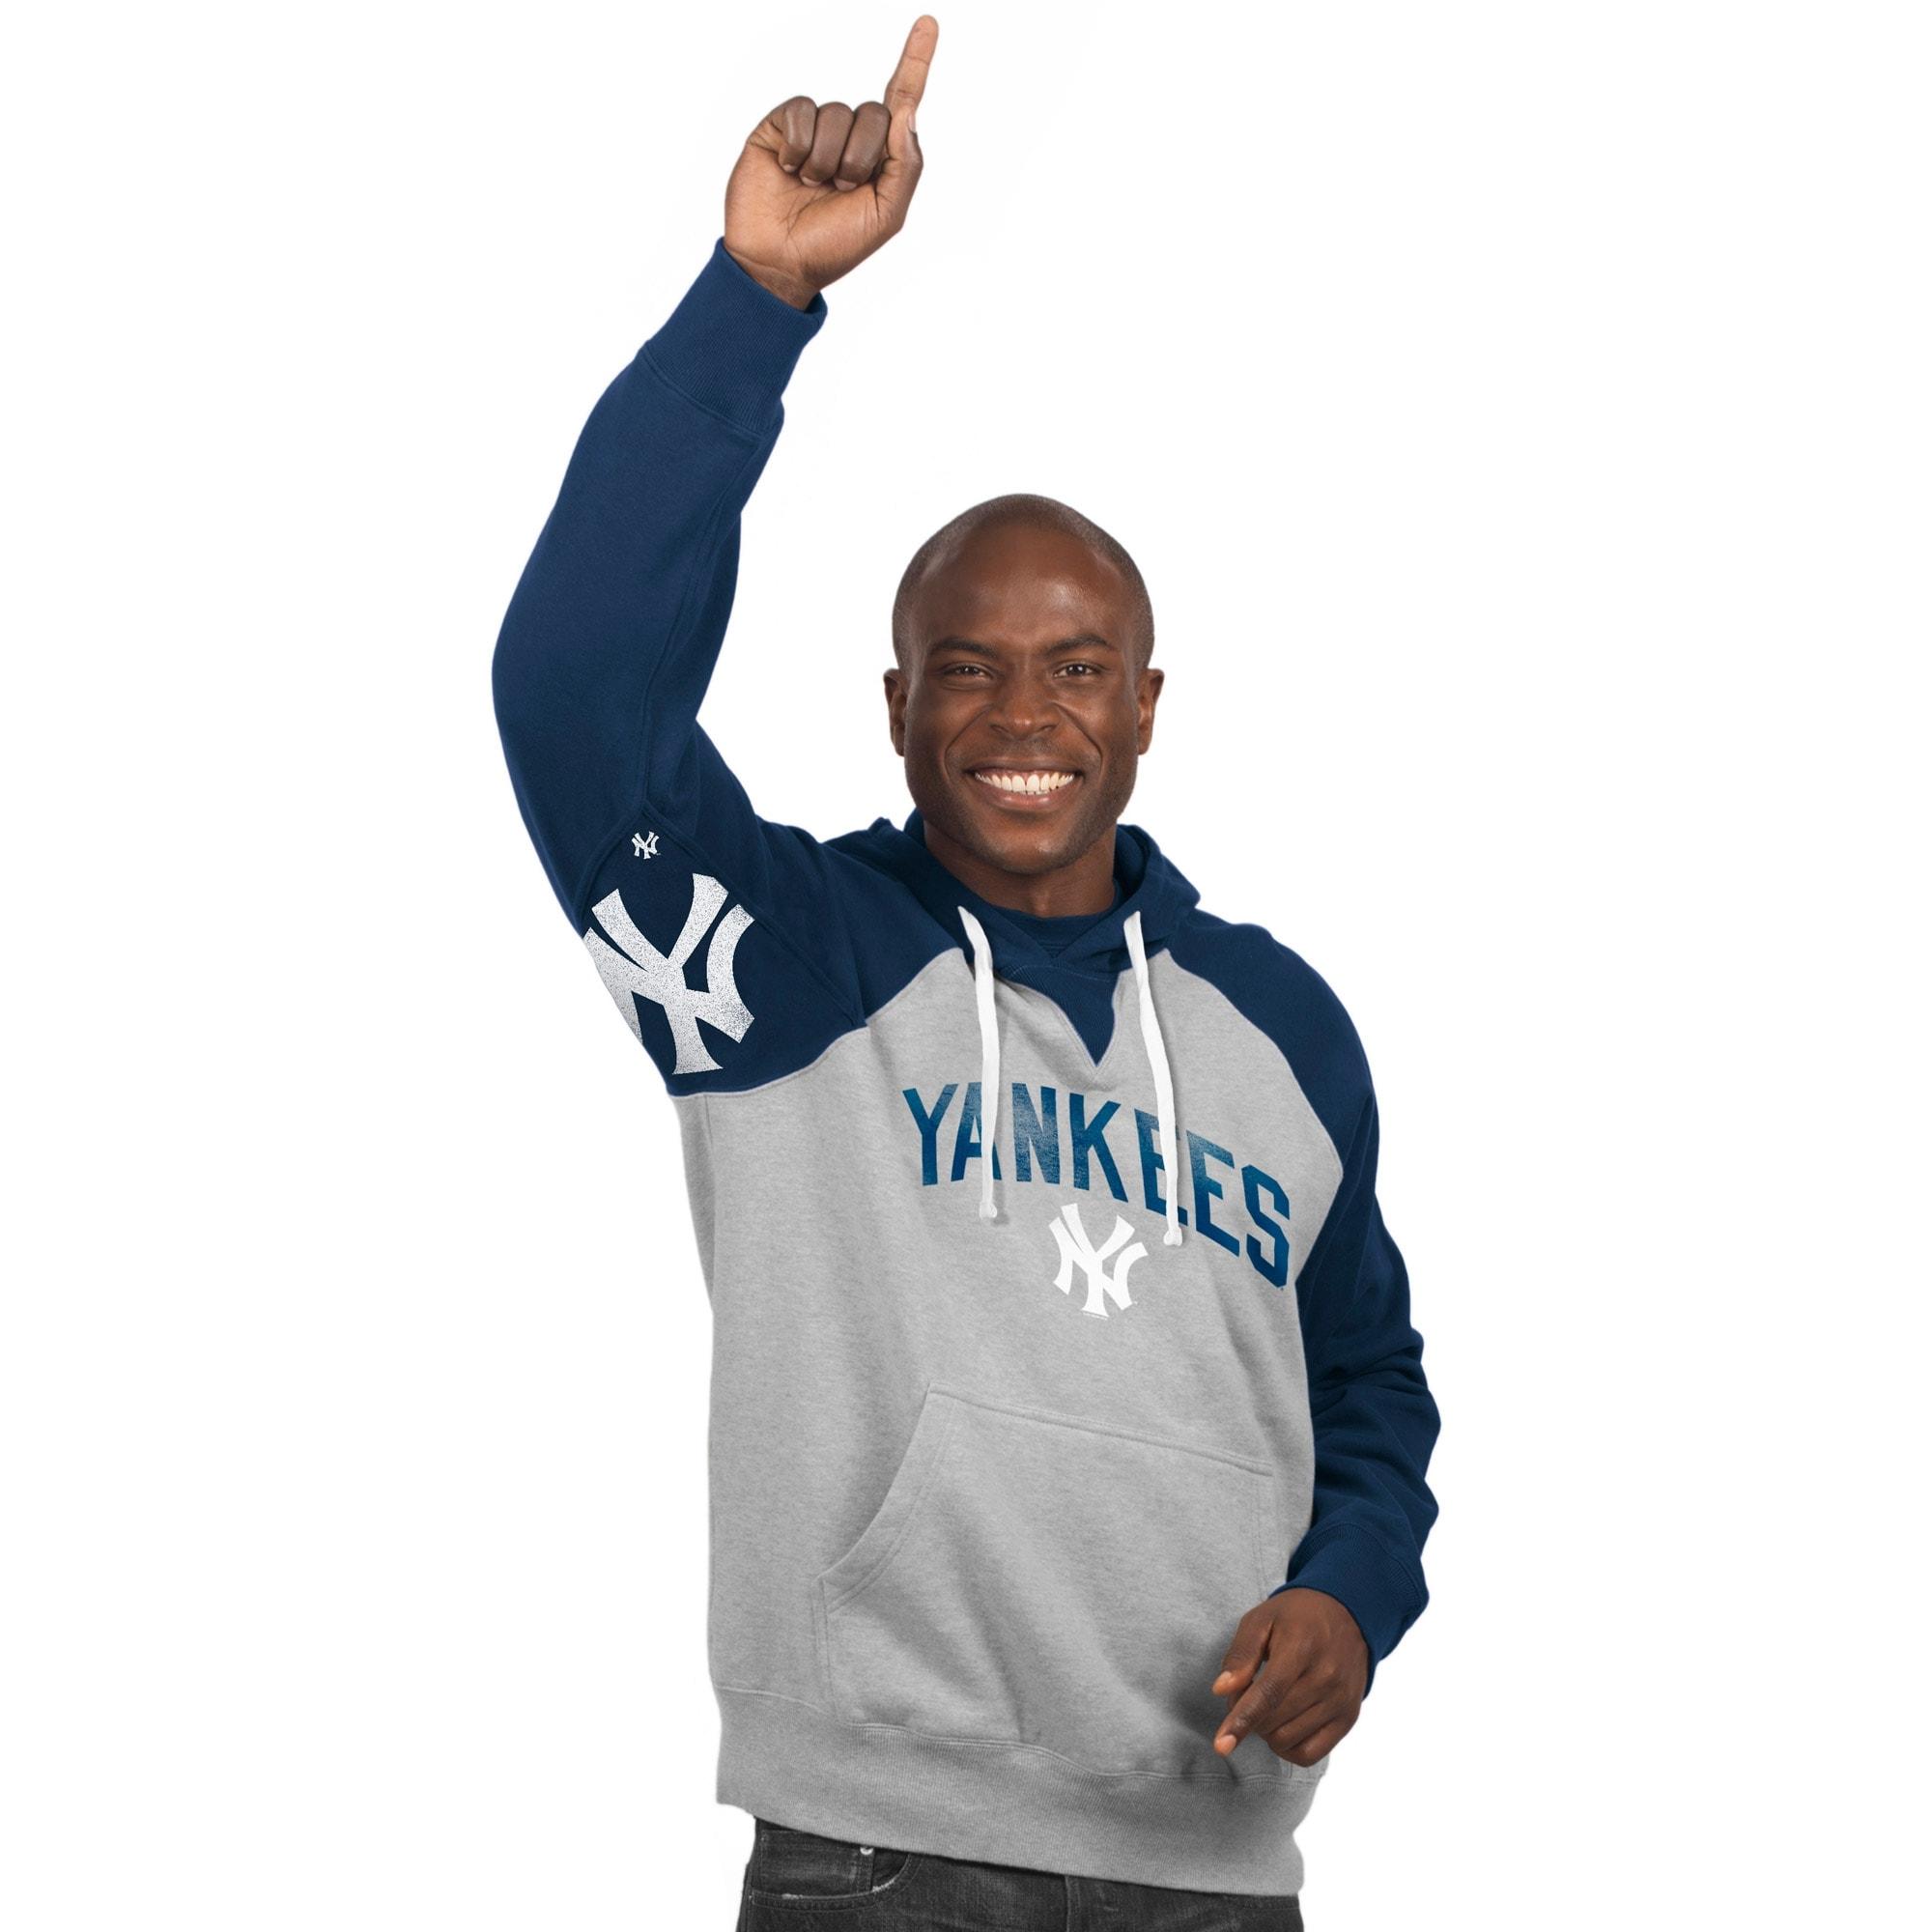 New York Yankees Hands High Pullover Hoodie - Gray